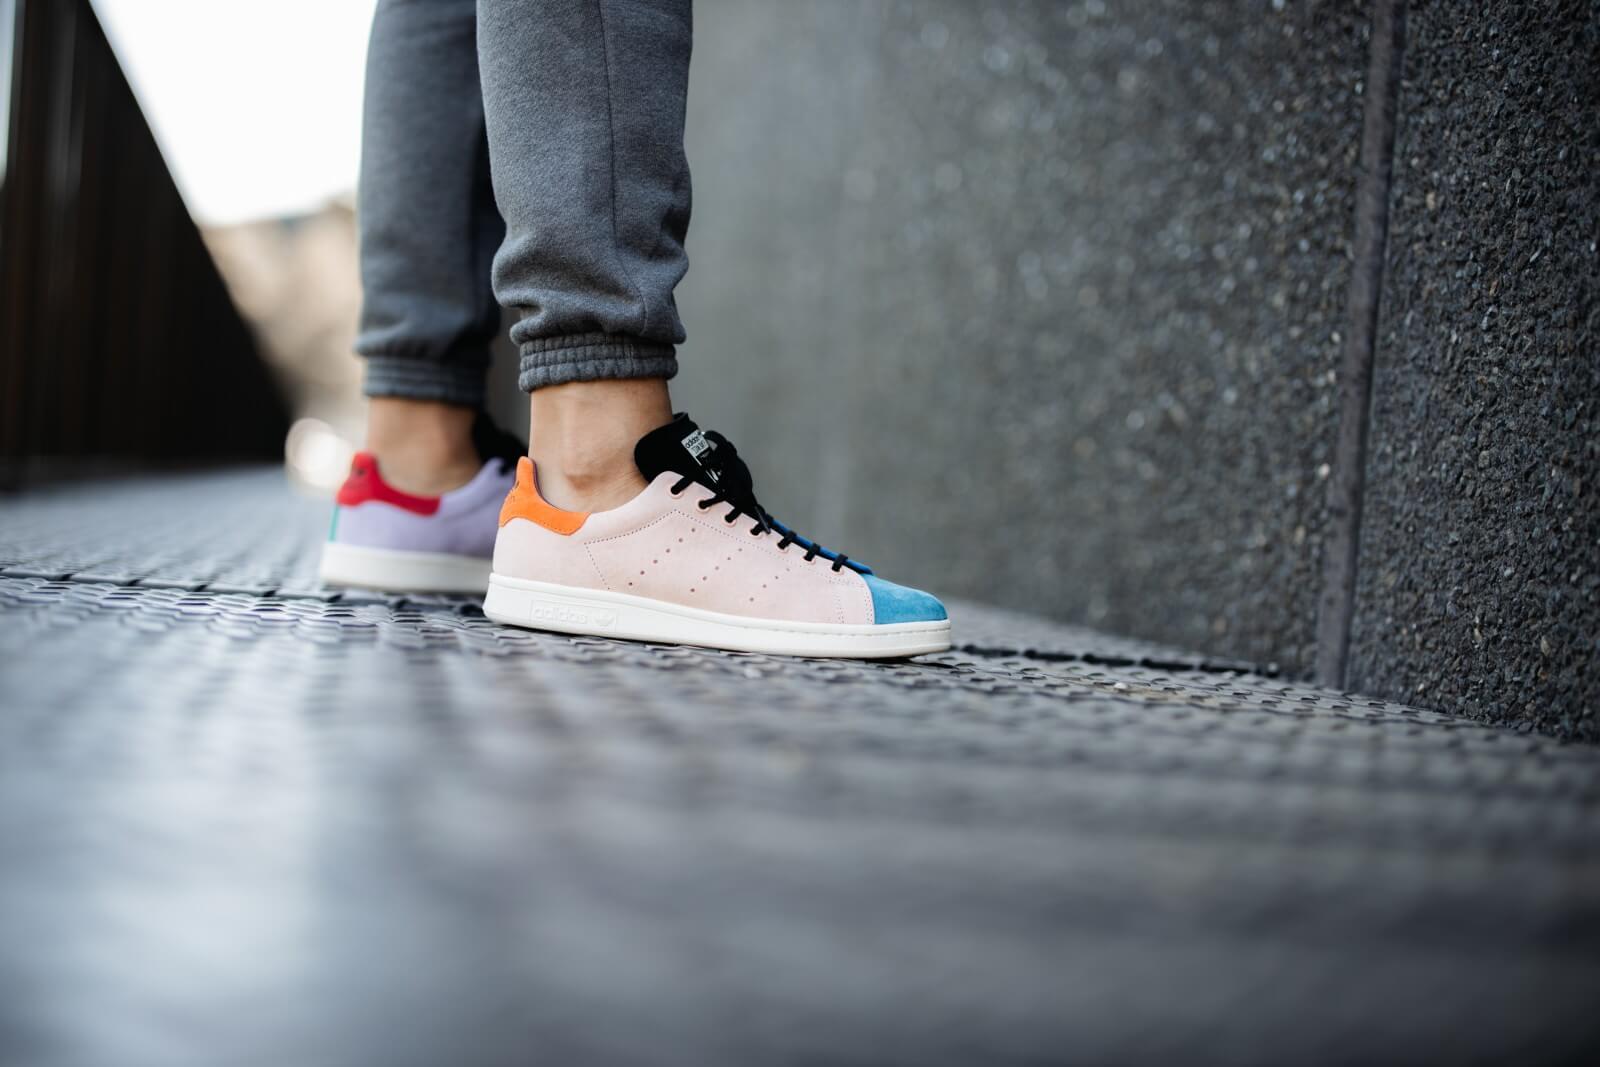 Adidas Stan Smith Recon Mismatch Vapour